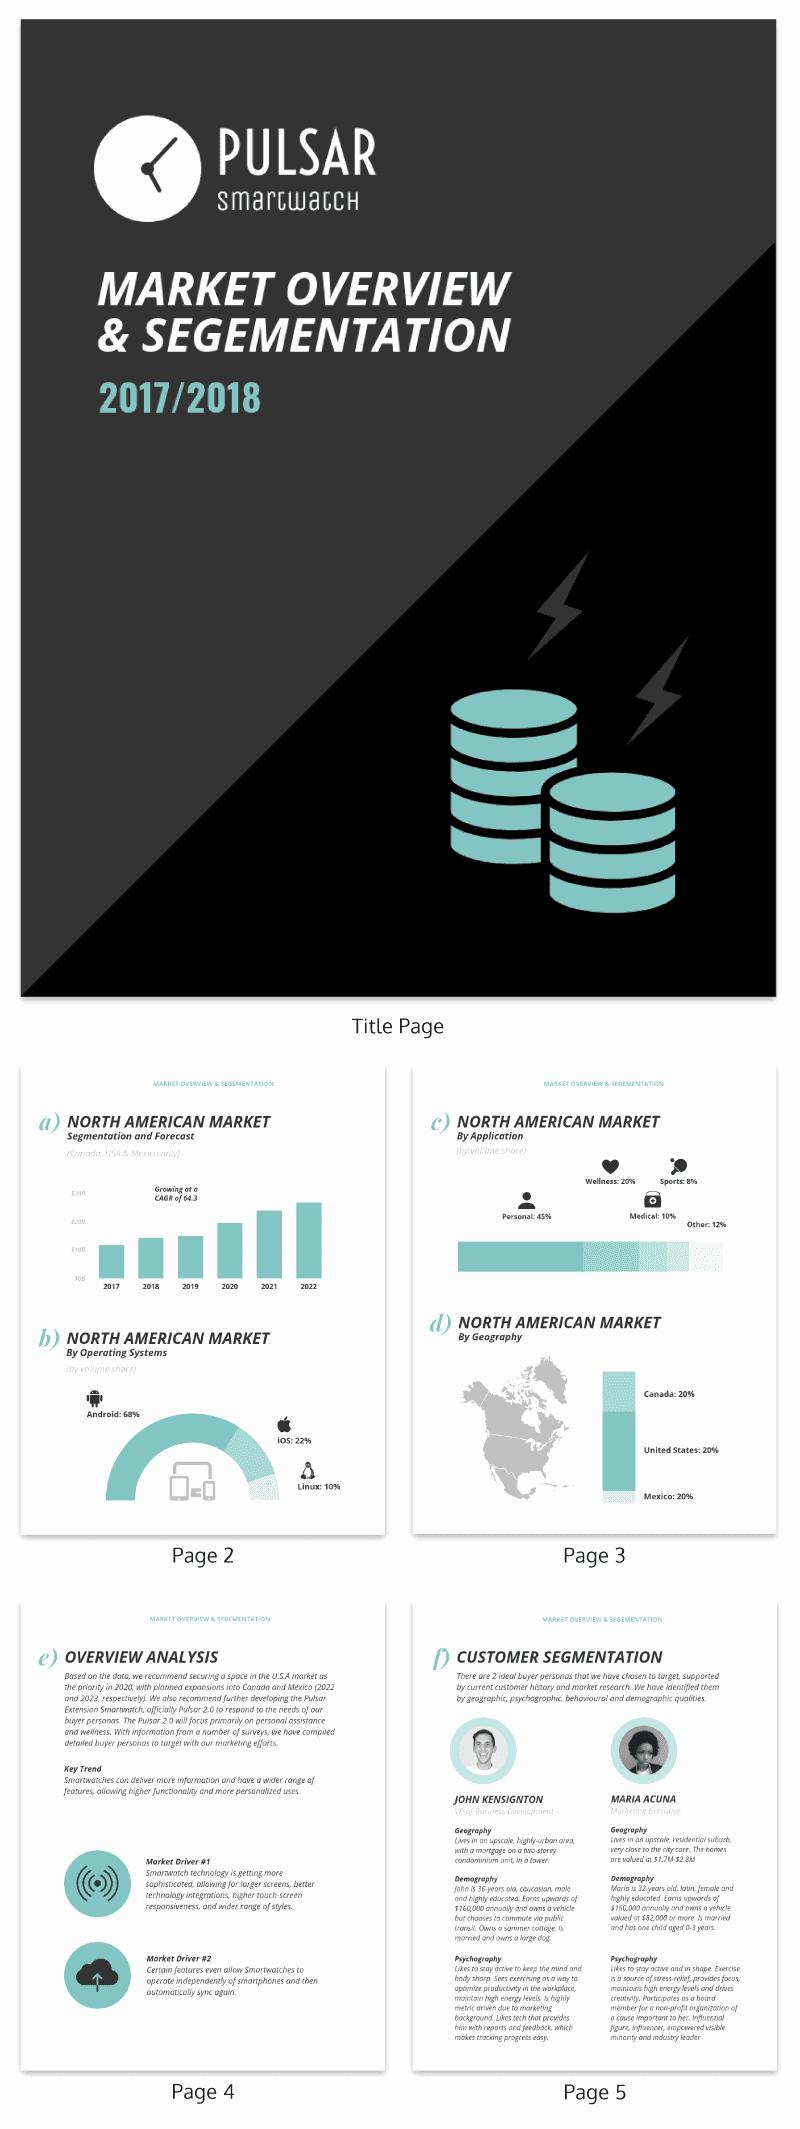 Annual Financial Report Template Elegant 50 Customizable Annual Report Design Templates Examples